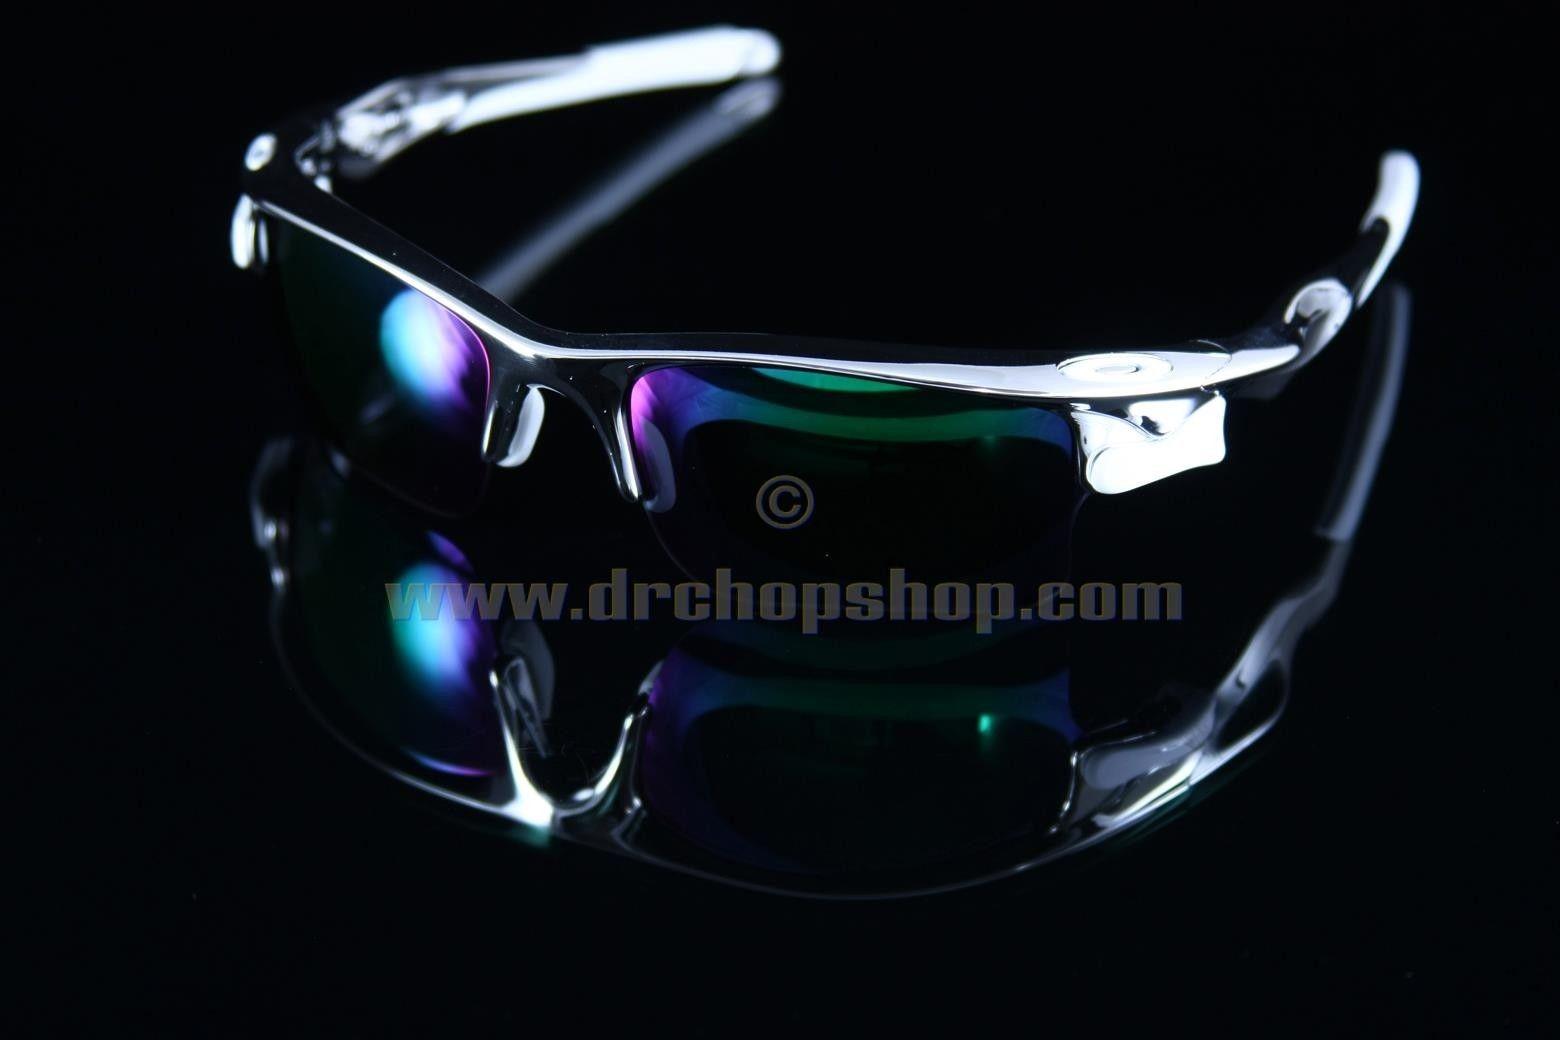 A Few Customs For Sale - 919350_606120869399603_771785874_o.jpg